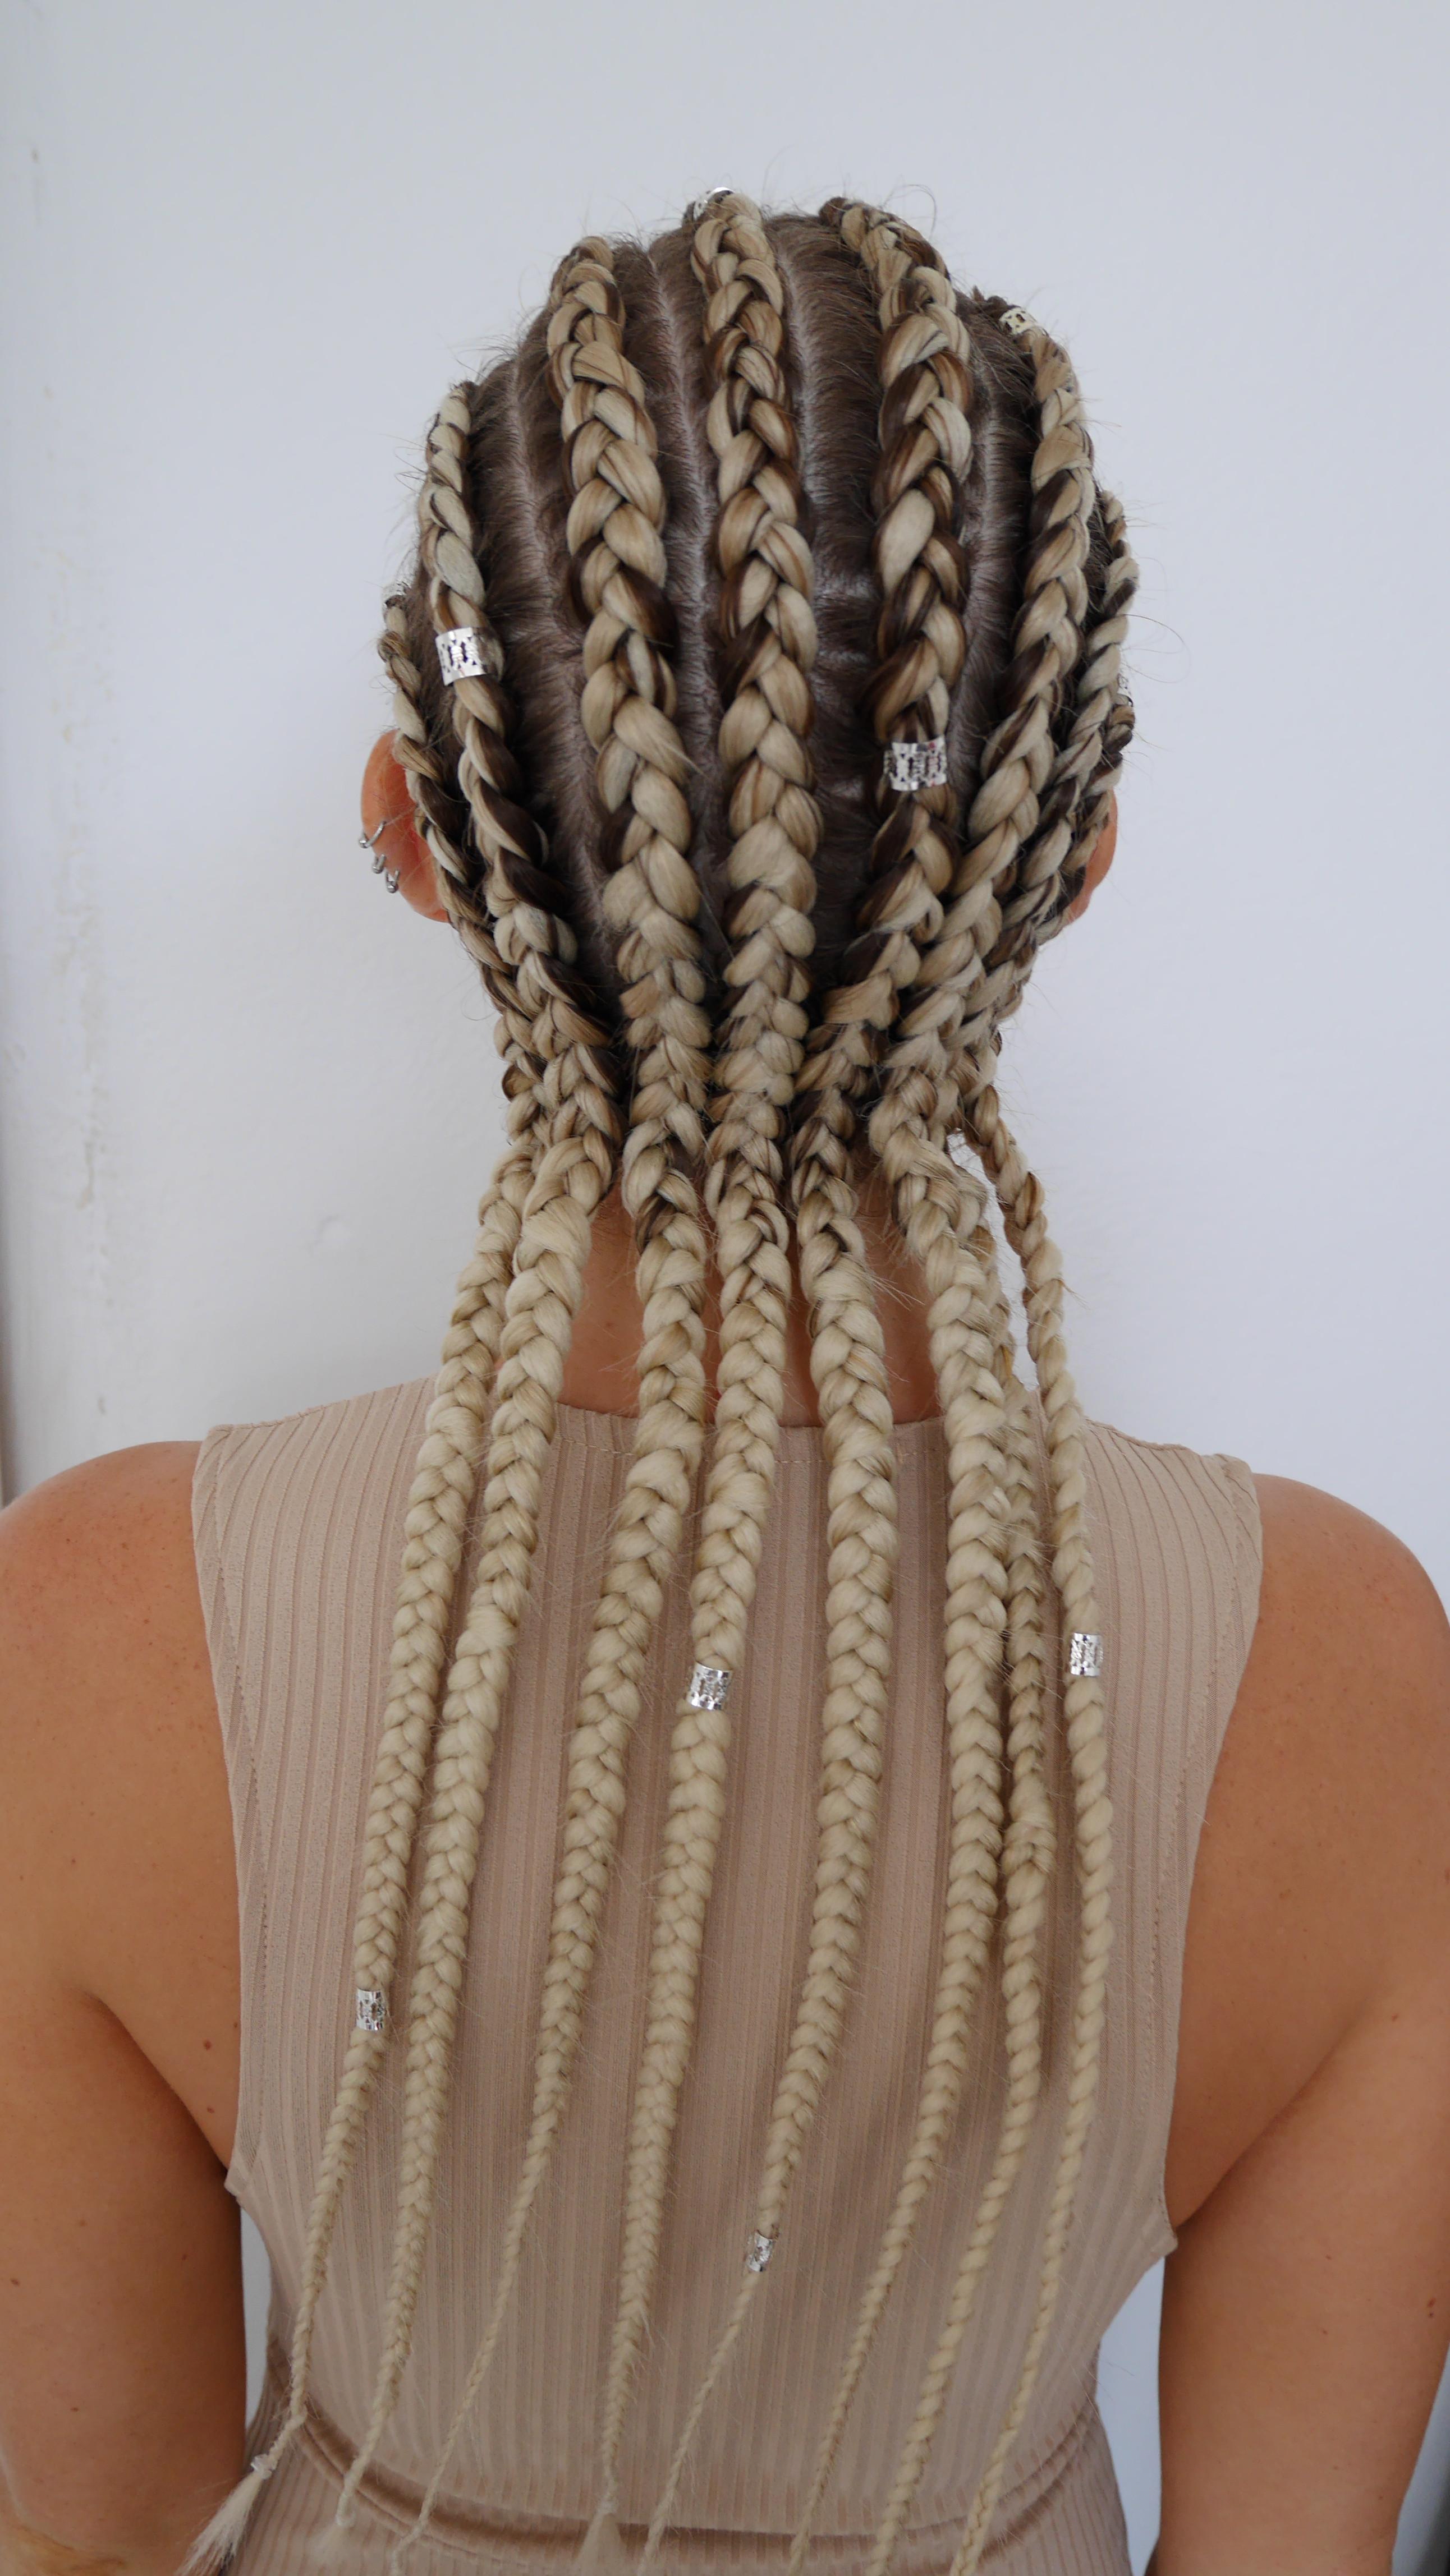 Full head corn rows w/ ext